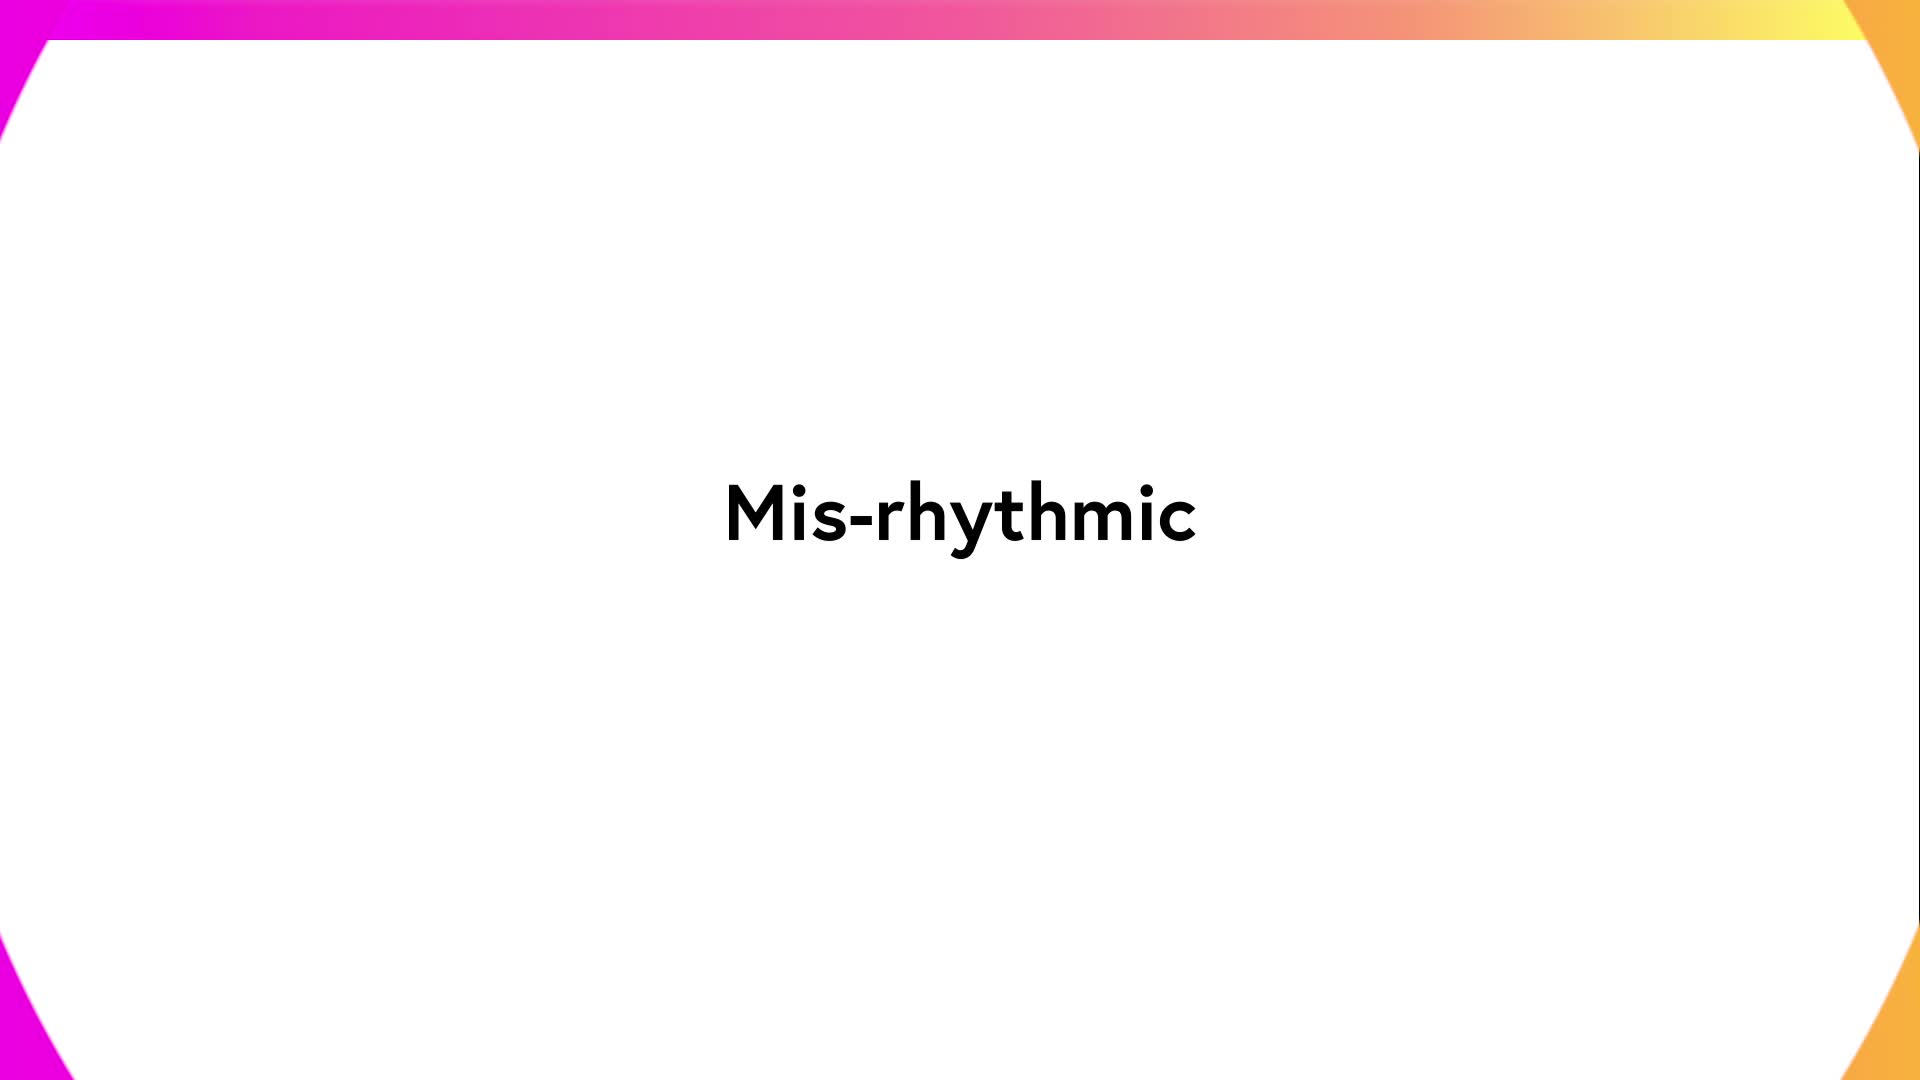 Mis-rhythmic